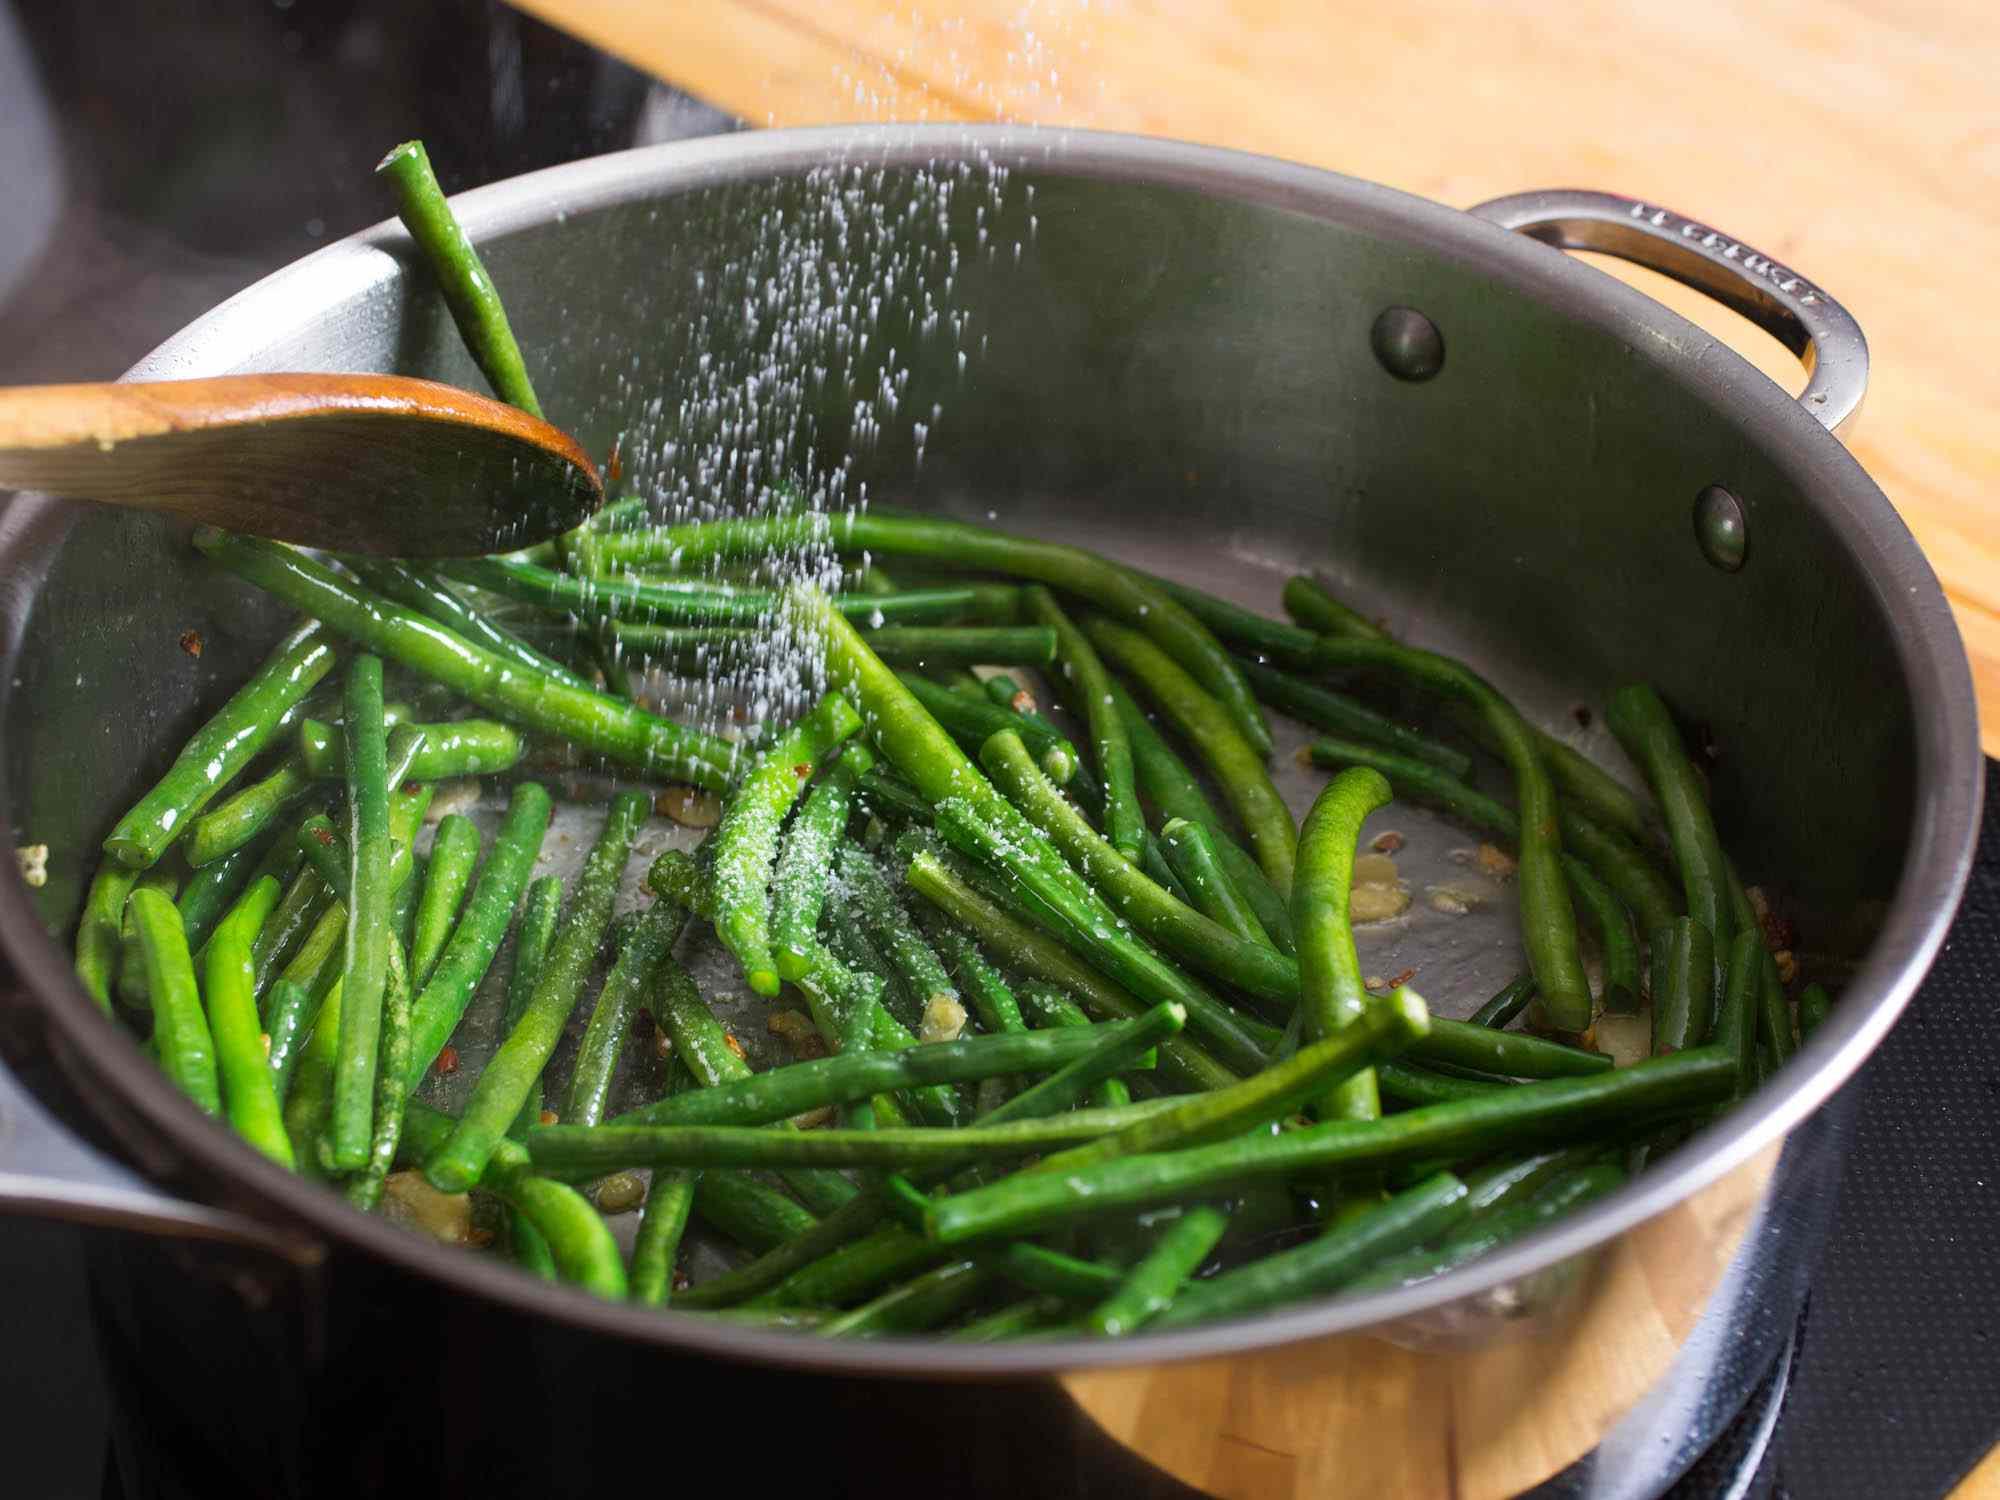 20150715-braised-long-beans-vicky-wasik-4.jpg